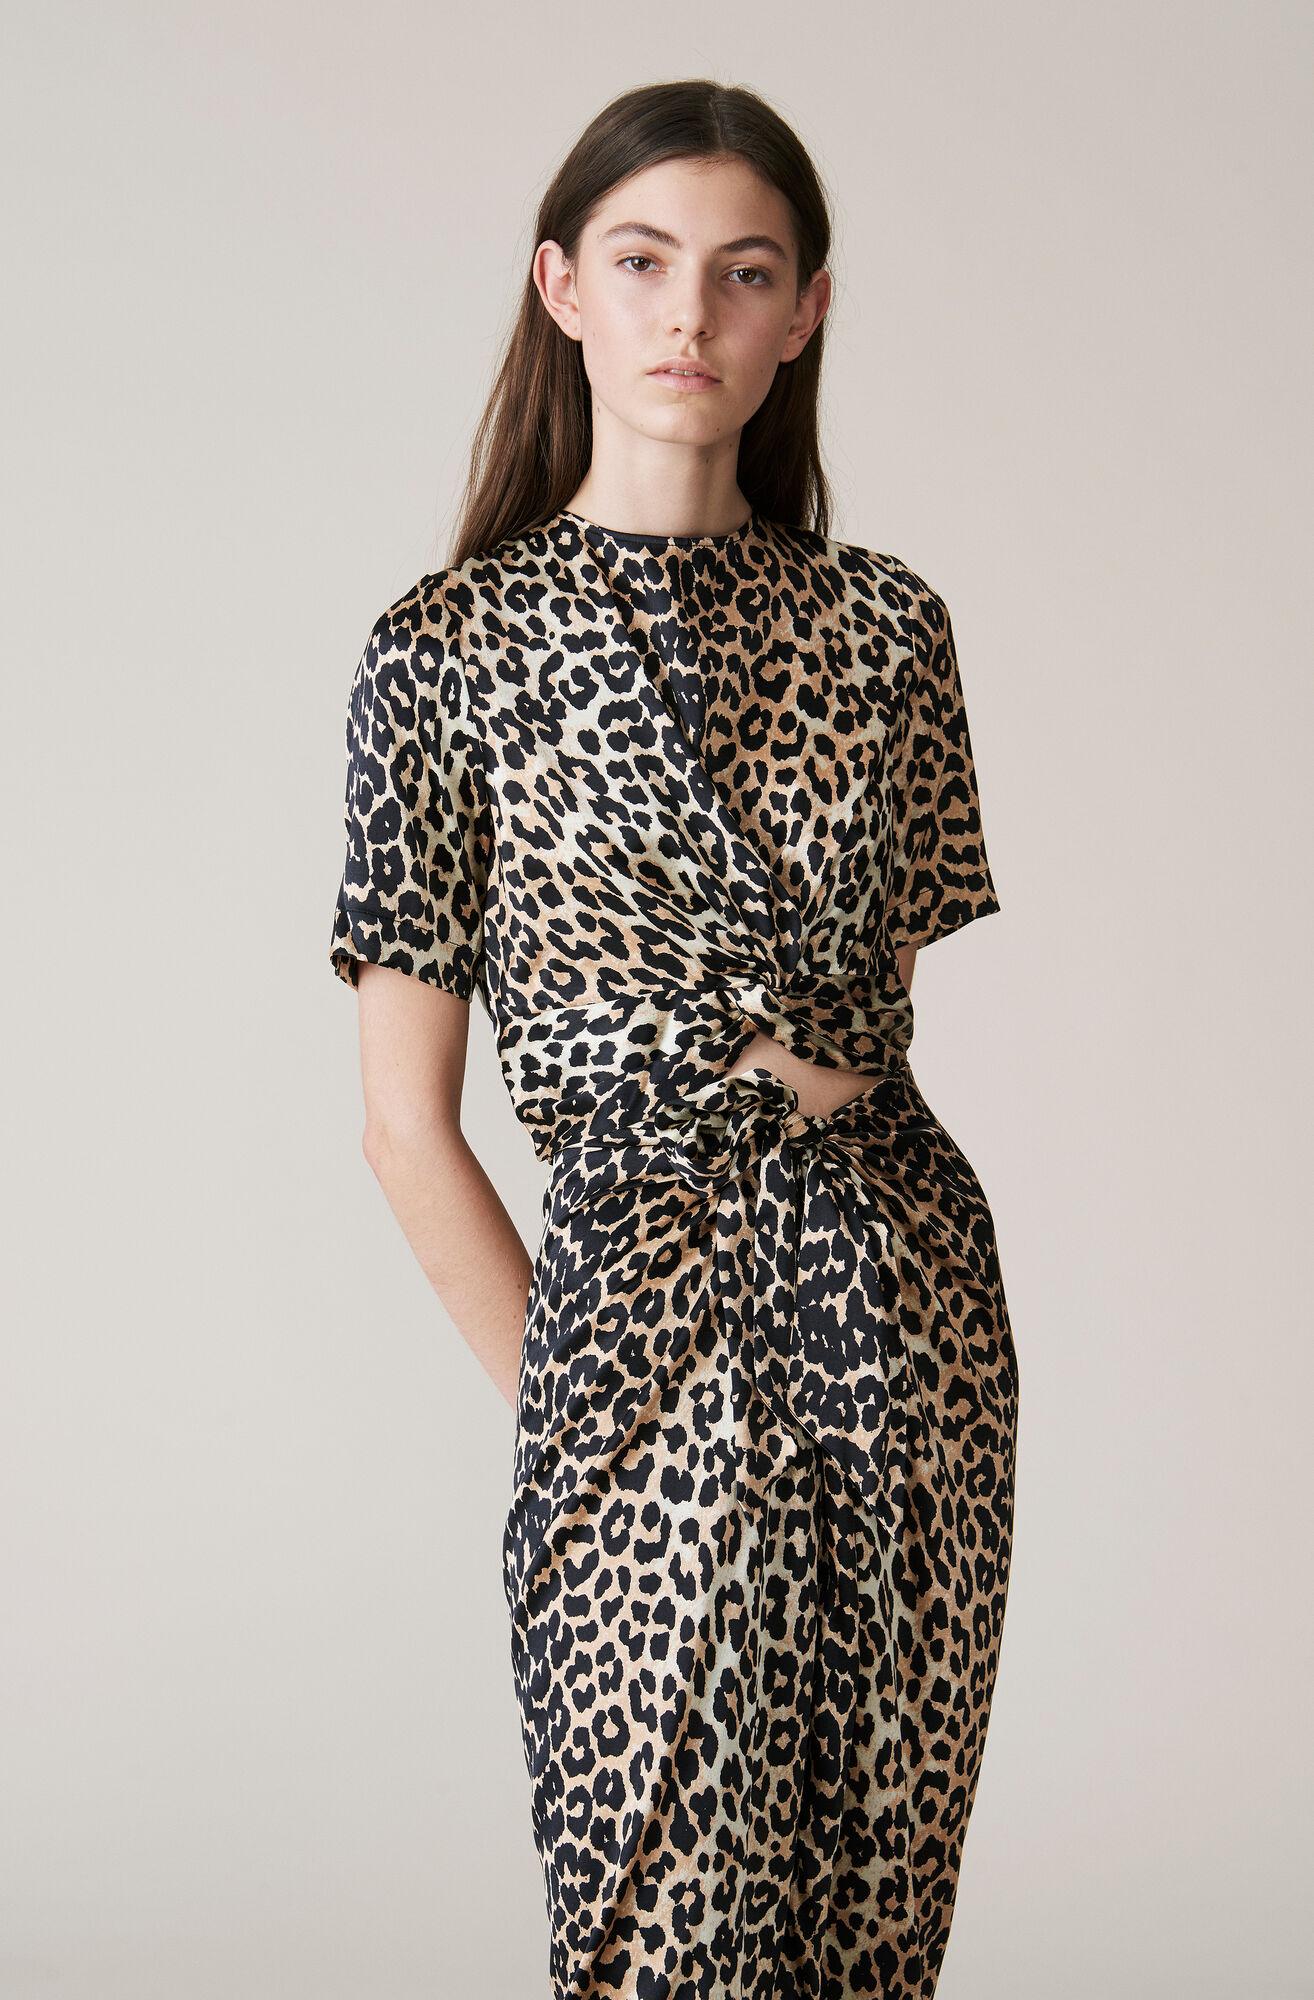 a5576dee GANNI Calla Silk Twist Blouse ( 160.00 GBP ) | Shop your new Calla ...